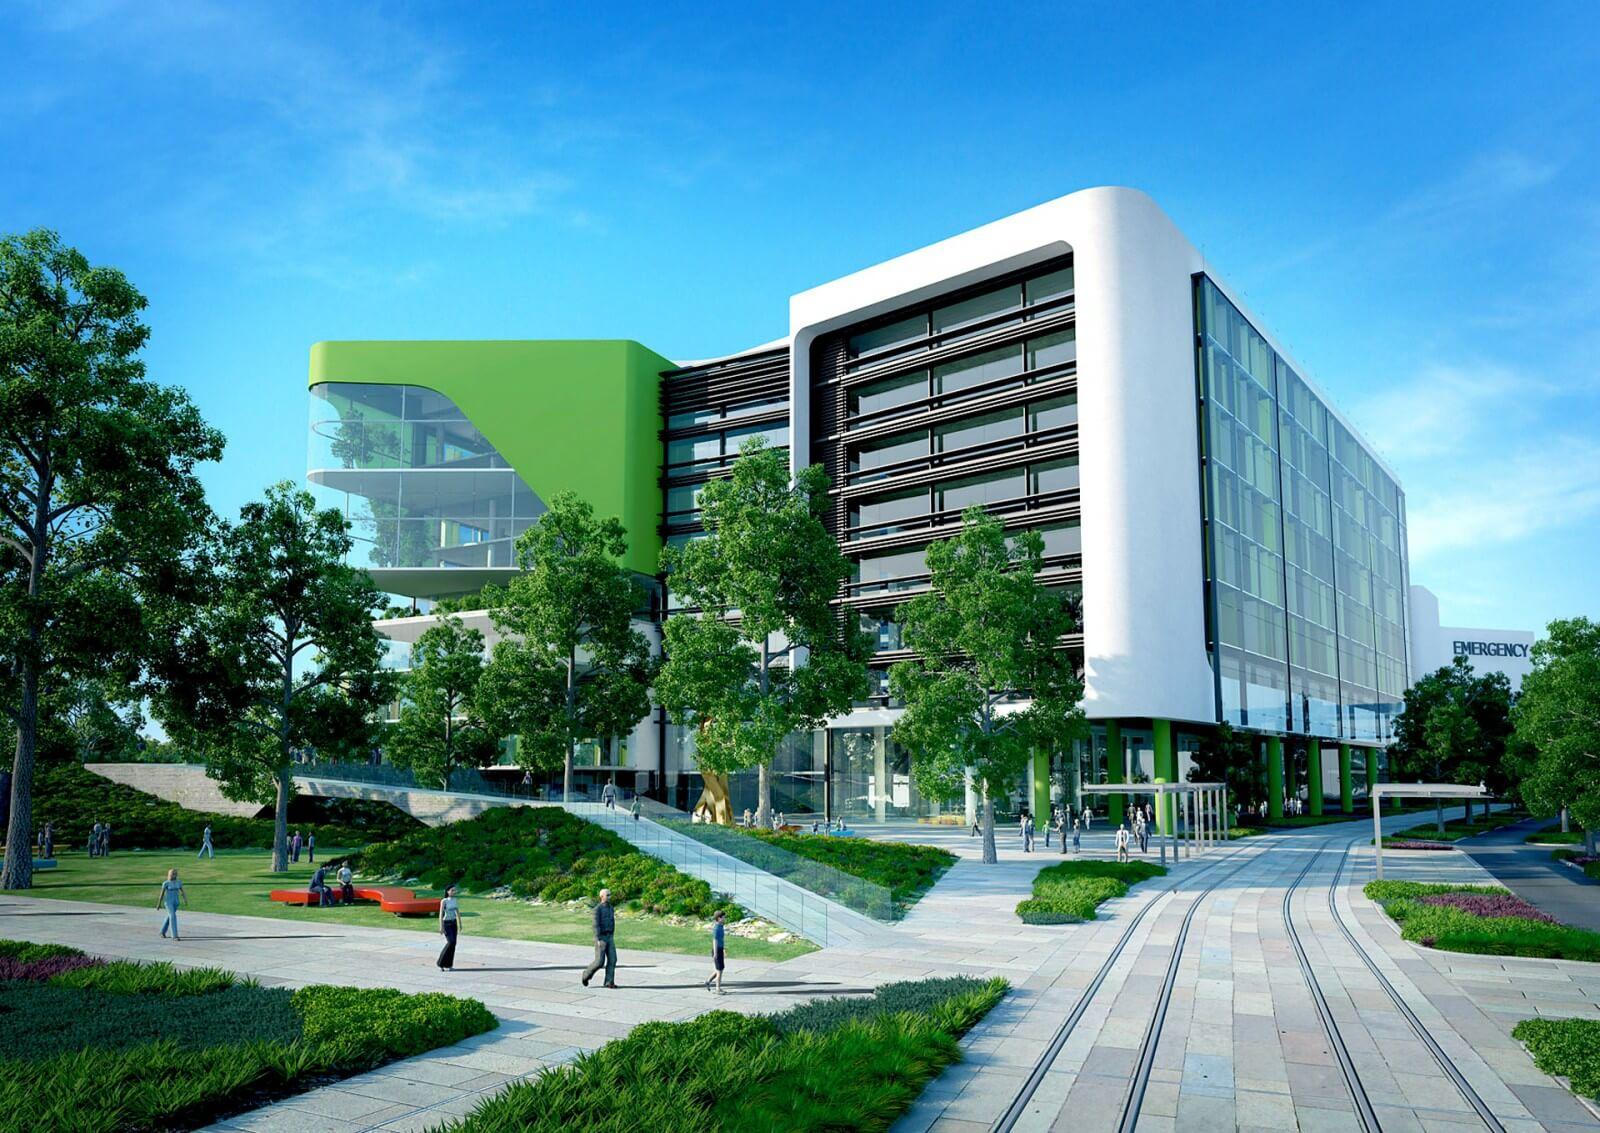 new-childrens-hospital_main-1600x1133